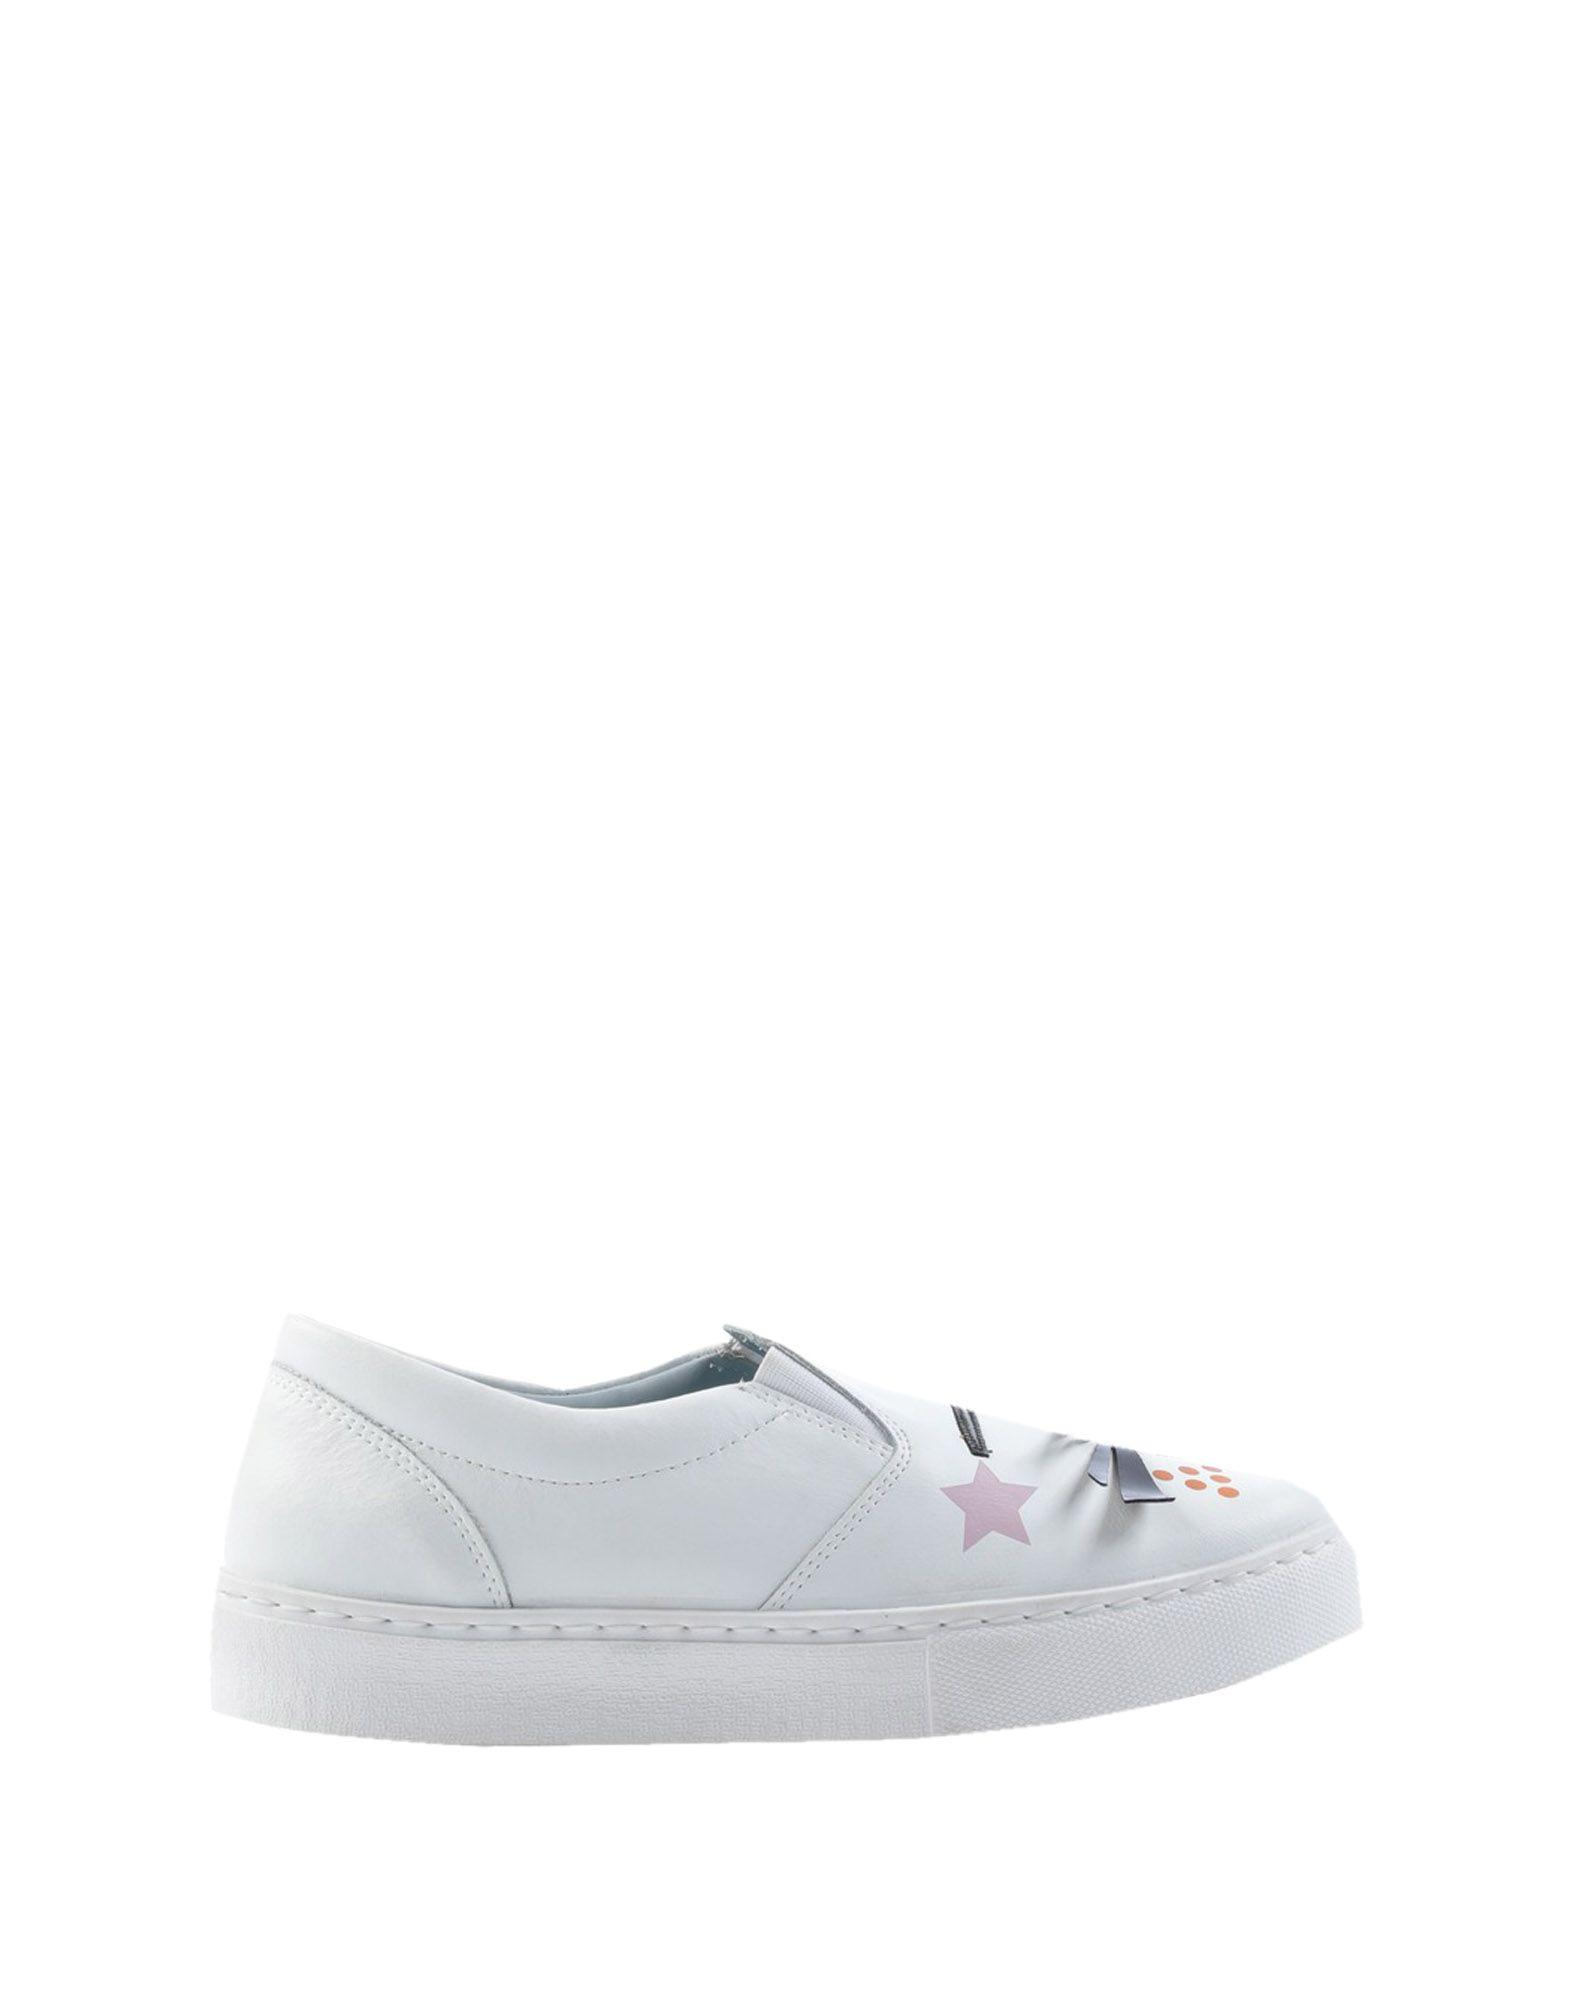 Stilvolle Ferragni billige Schuhe Chiara Ferragni Stilvolle Sneakers Damen  11548643PT 13bbfc